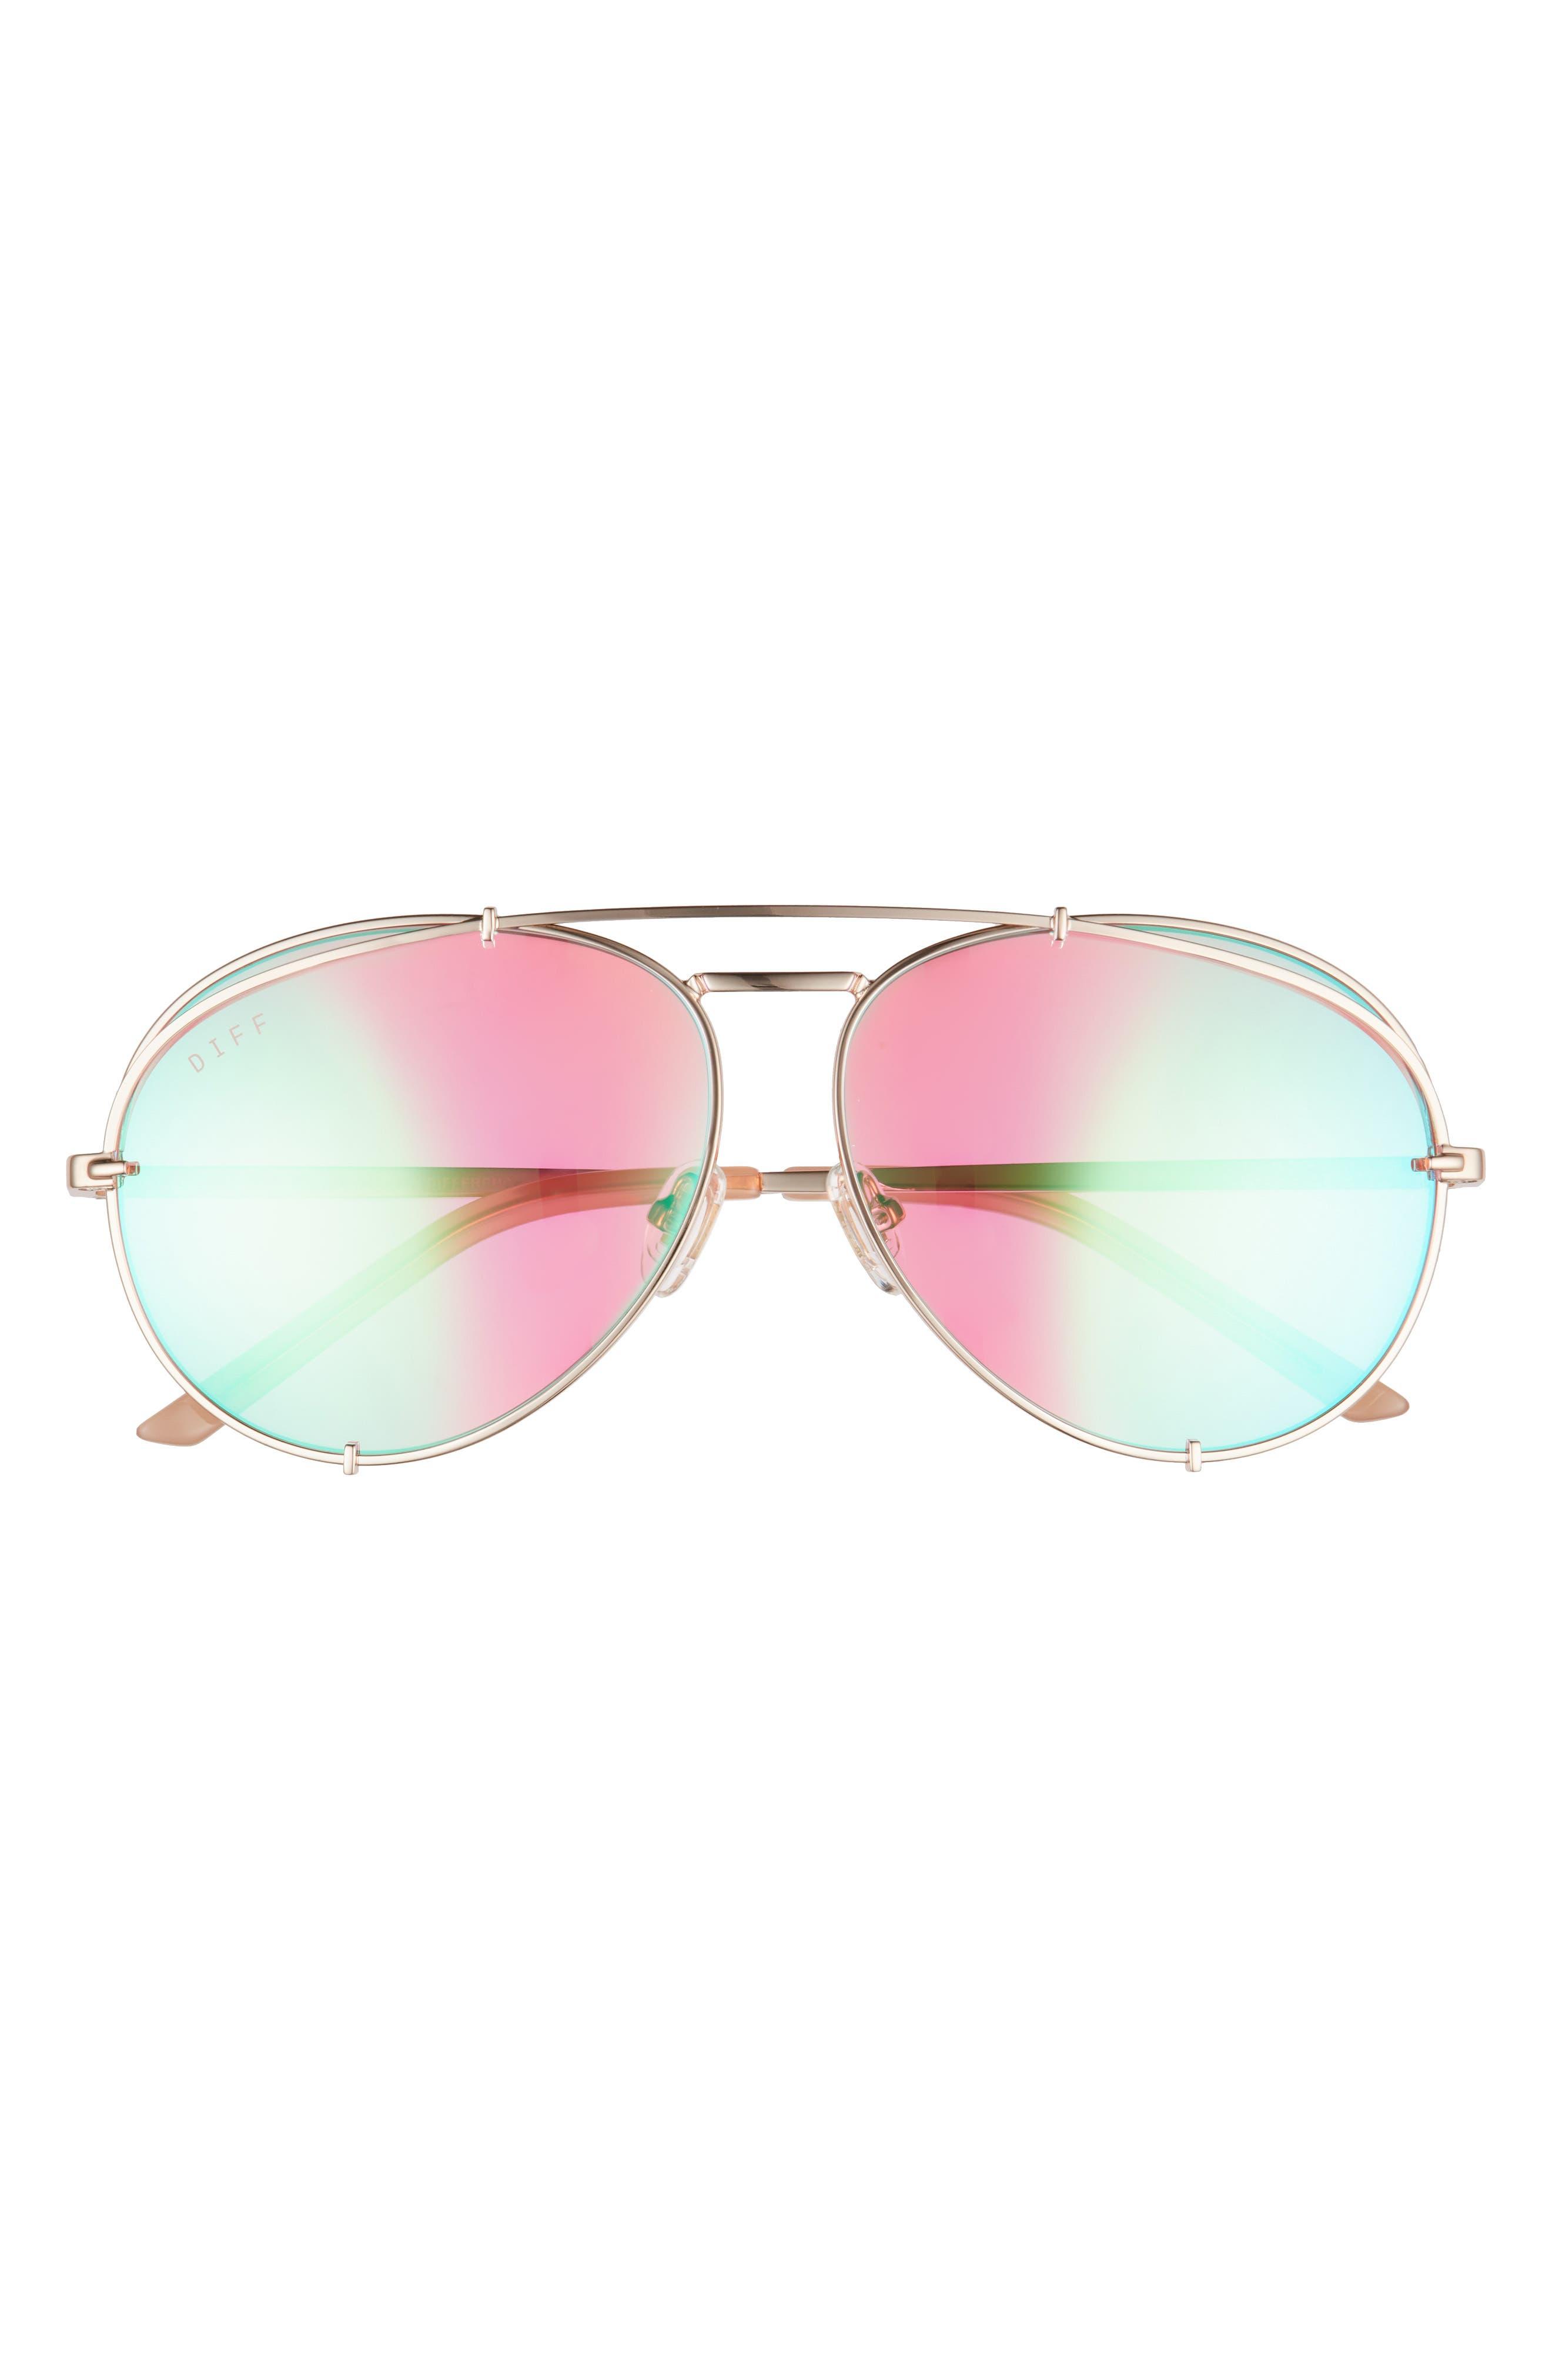 Koko 63mm Oversize Aviator Sunglasses